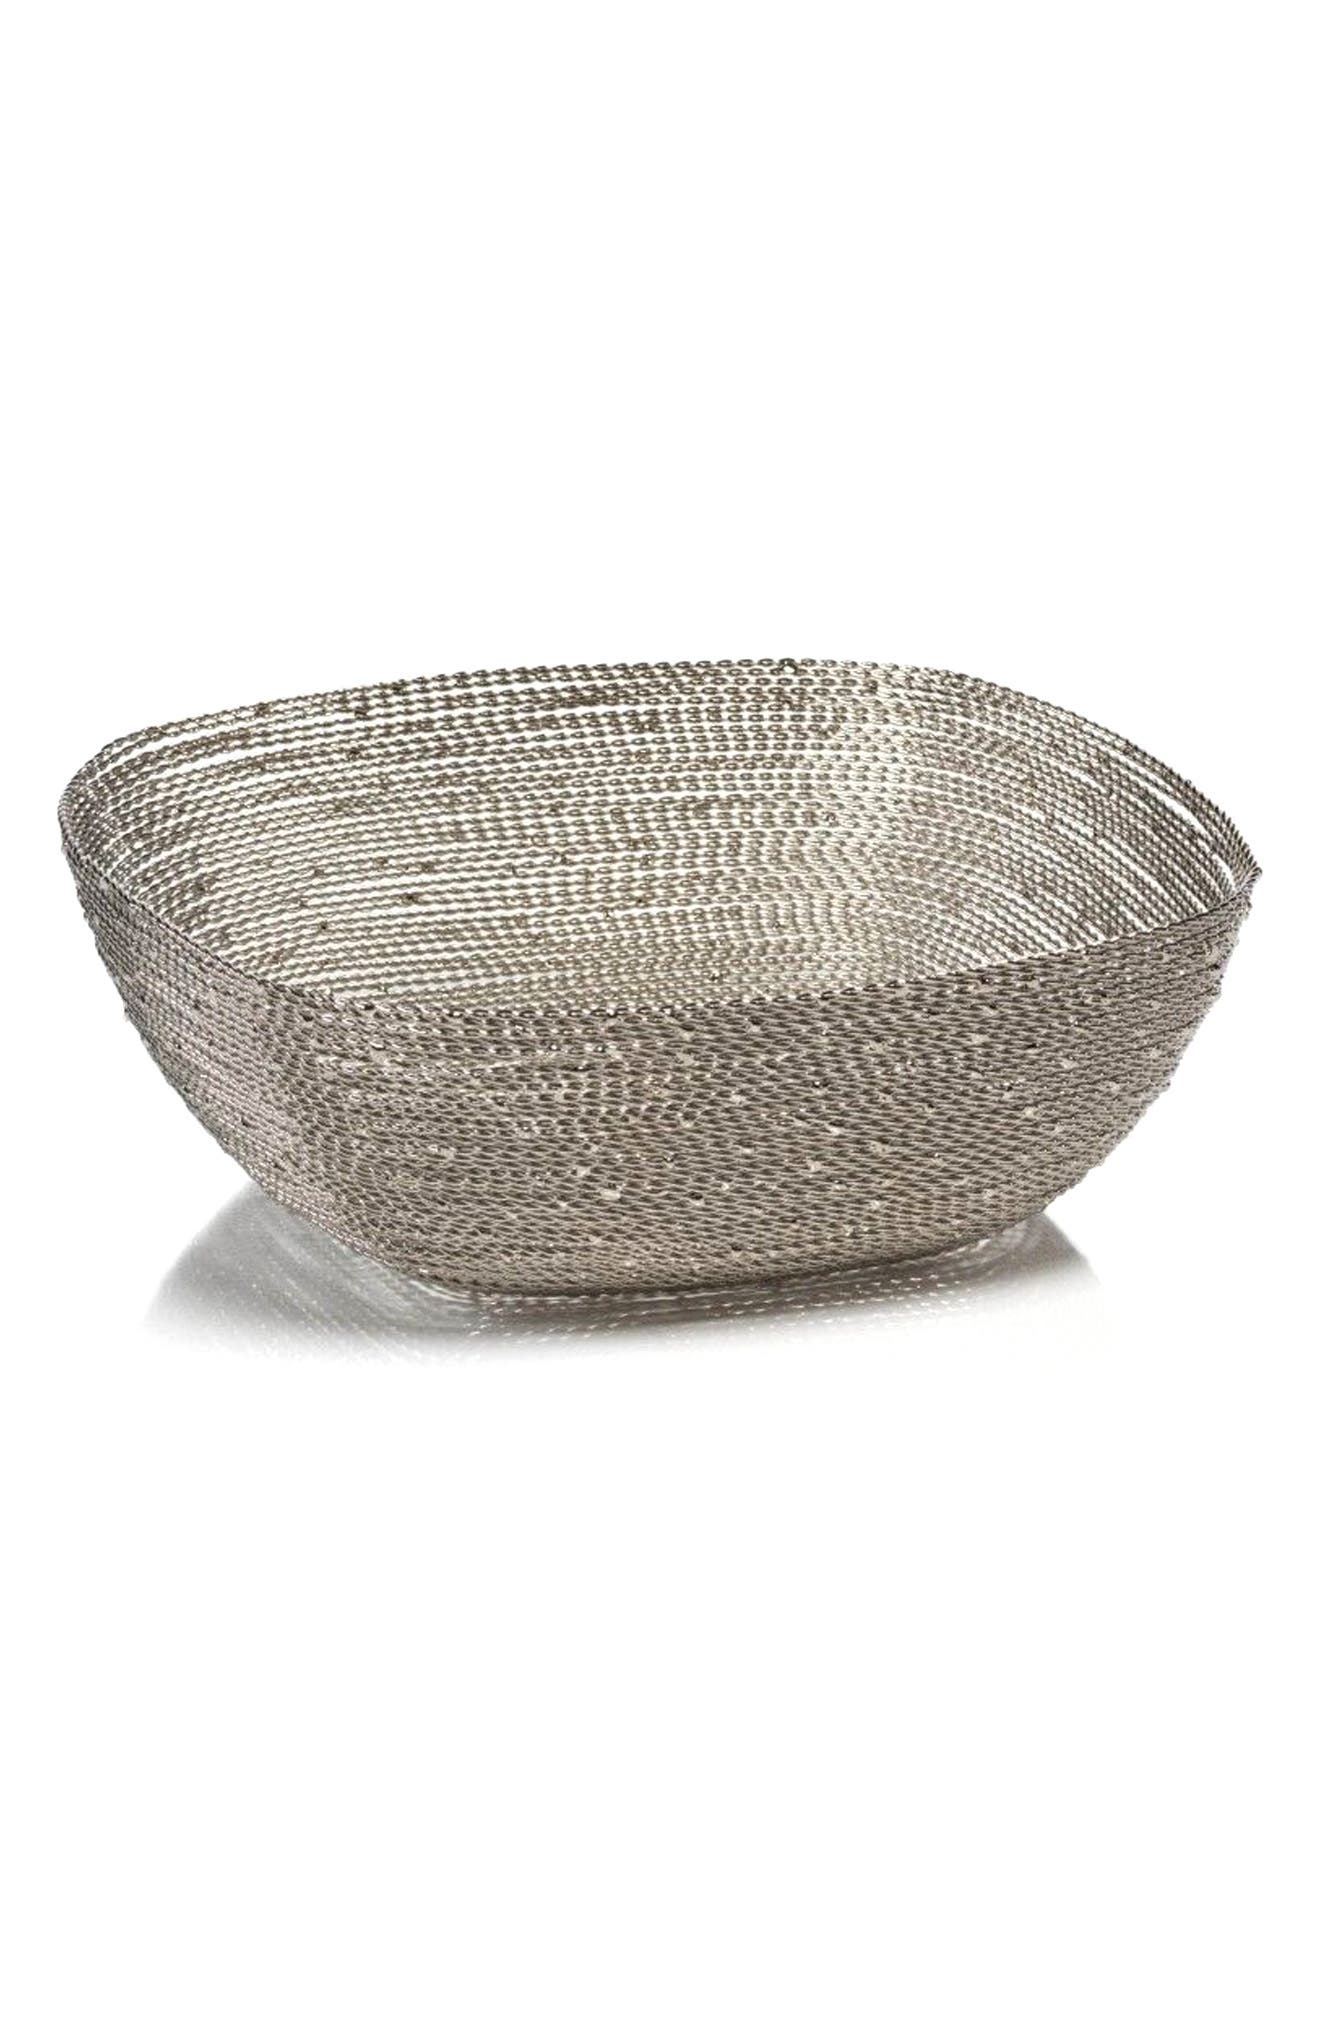 Zulu Small Square Woven Wire Basket,                         Main,                         color, Silver